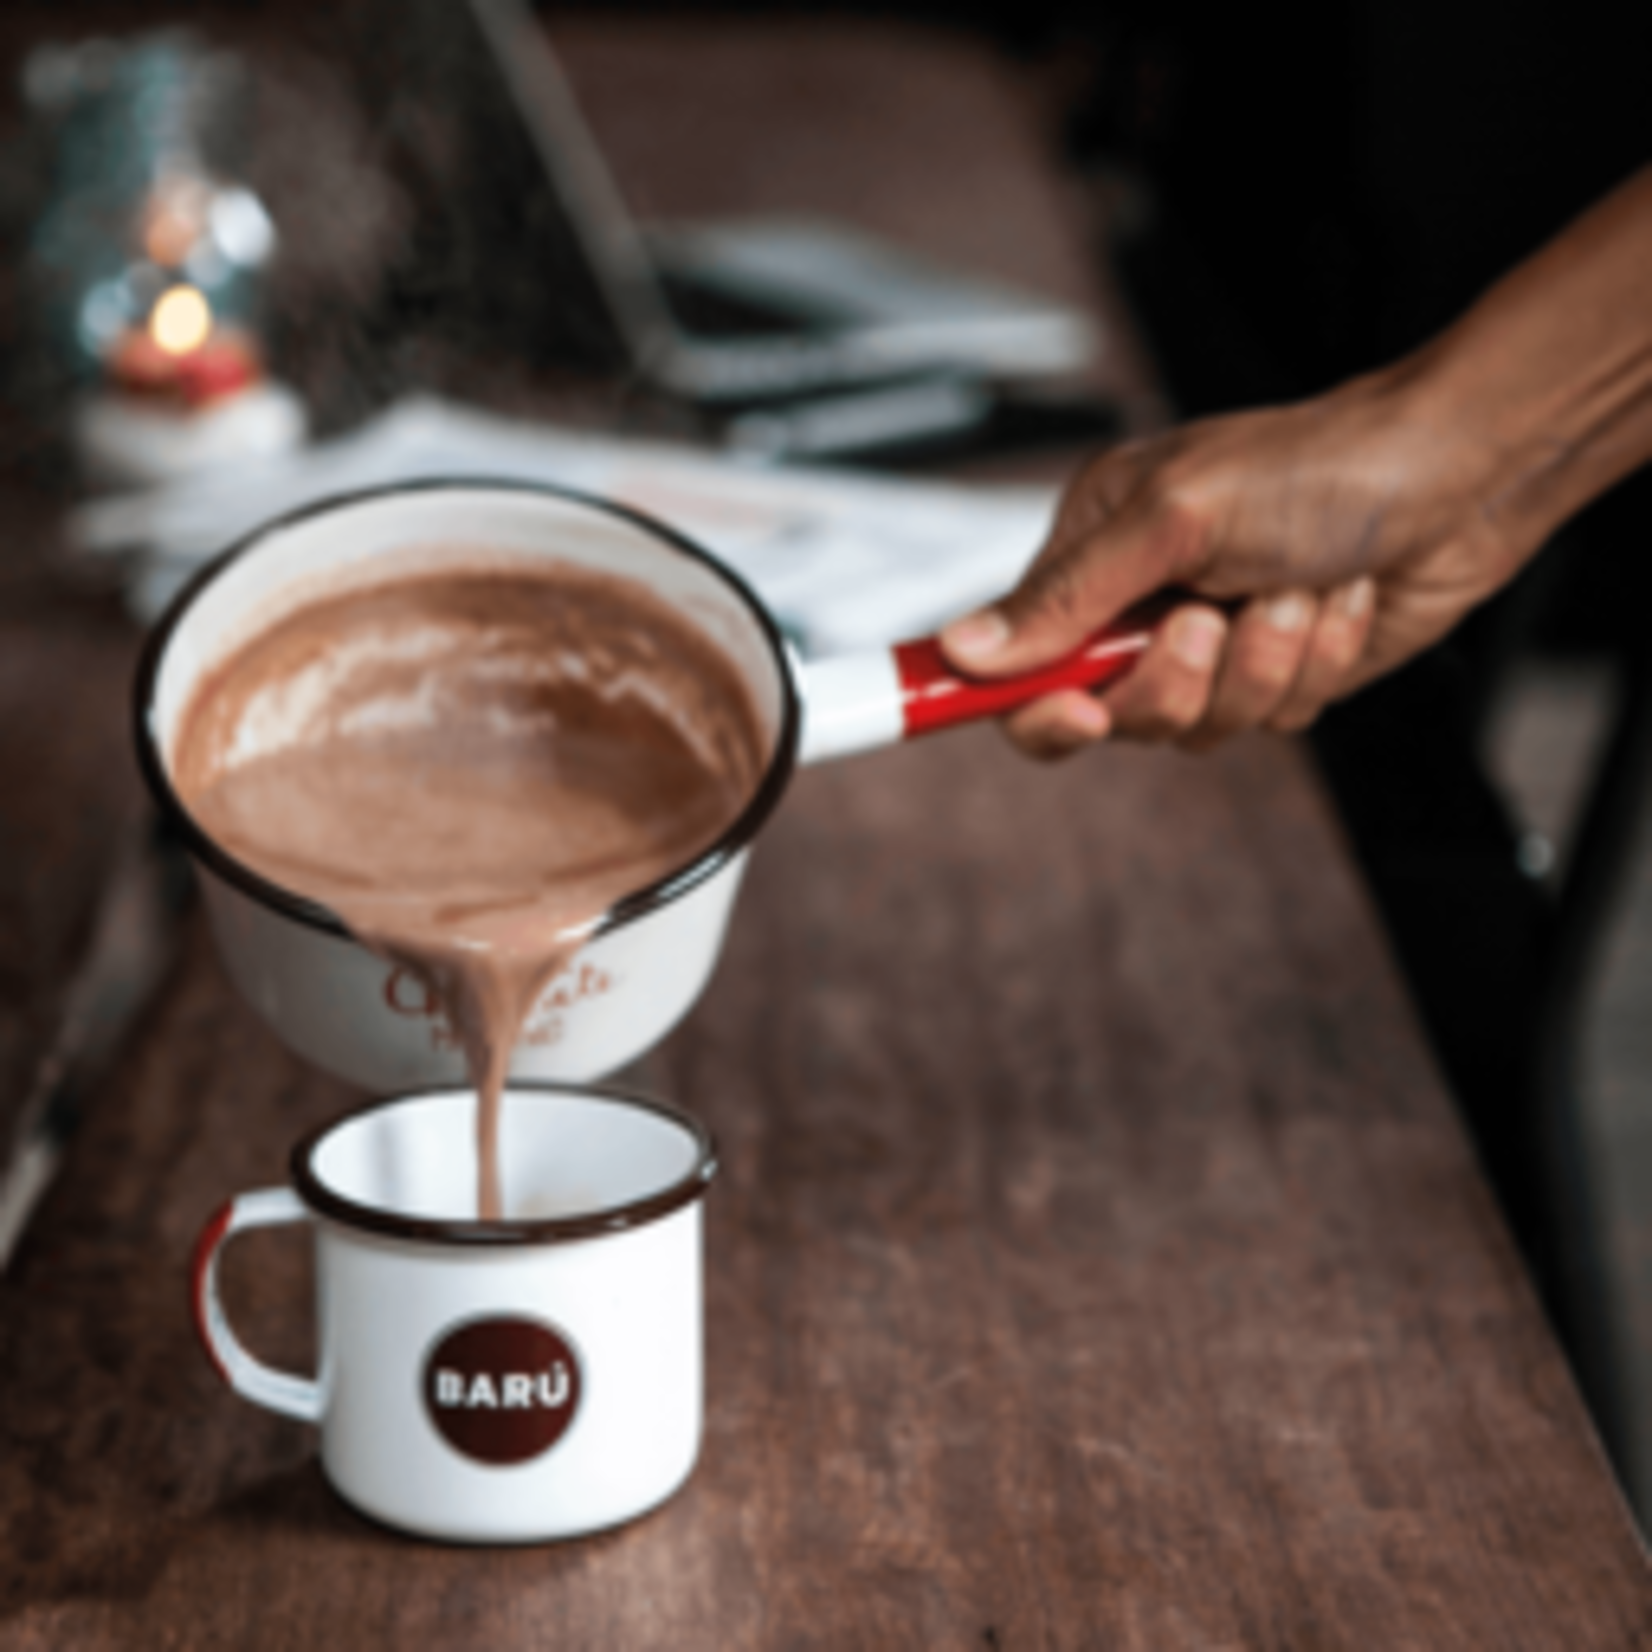 Barú Swirly hot chocolate powder